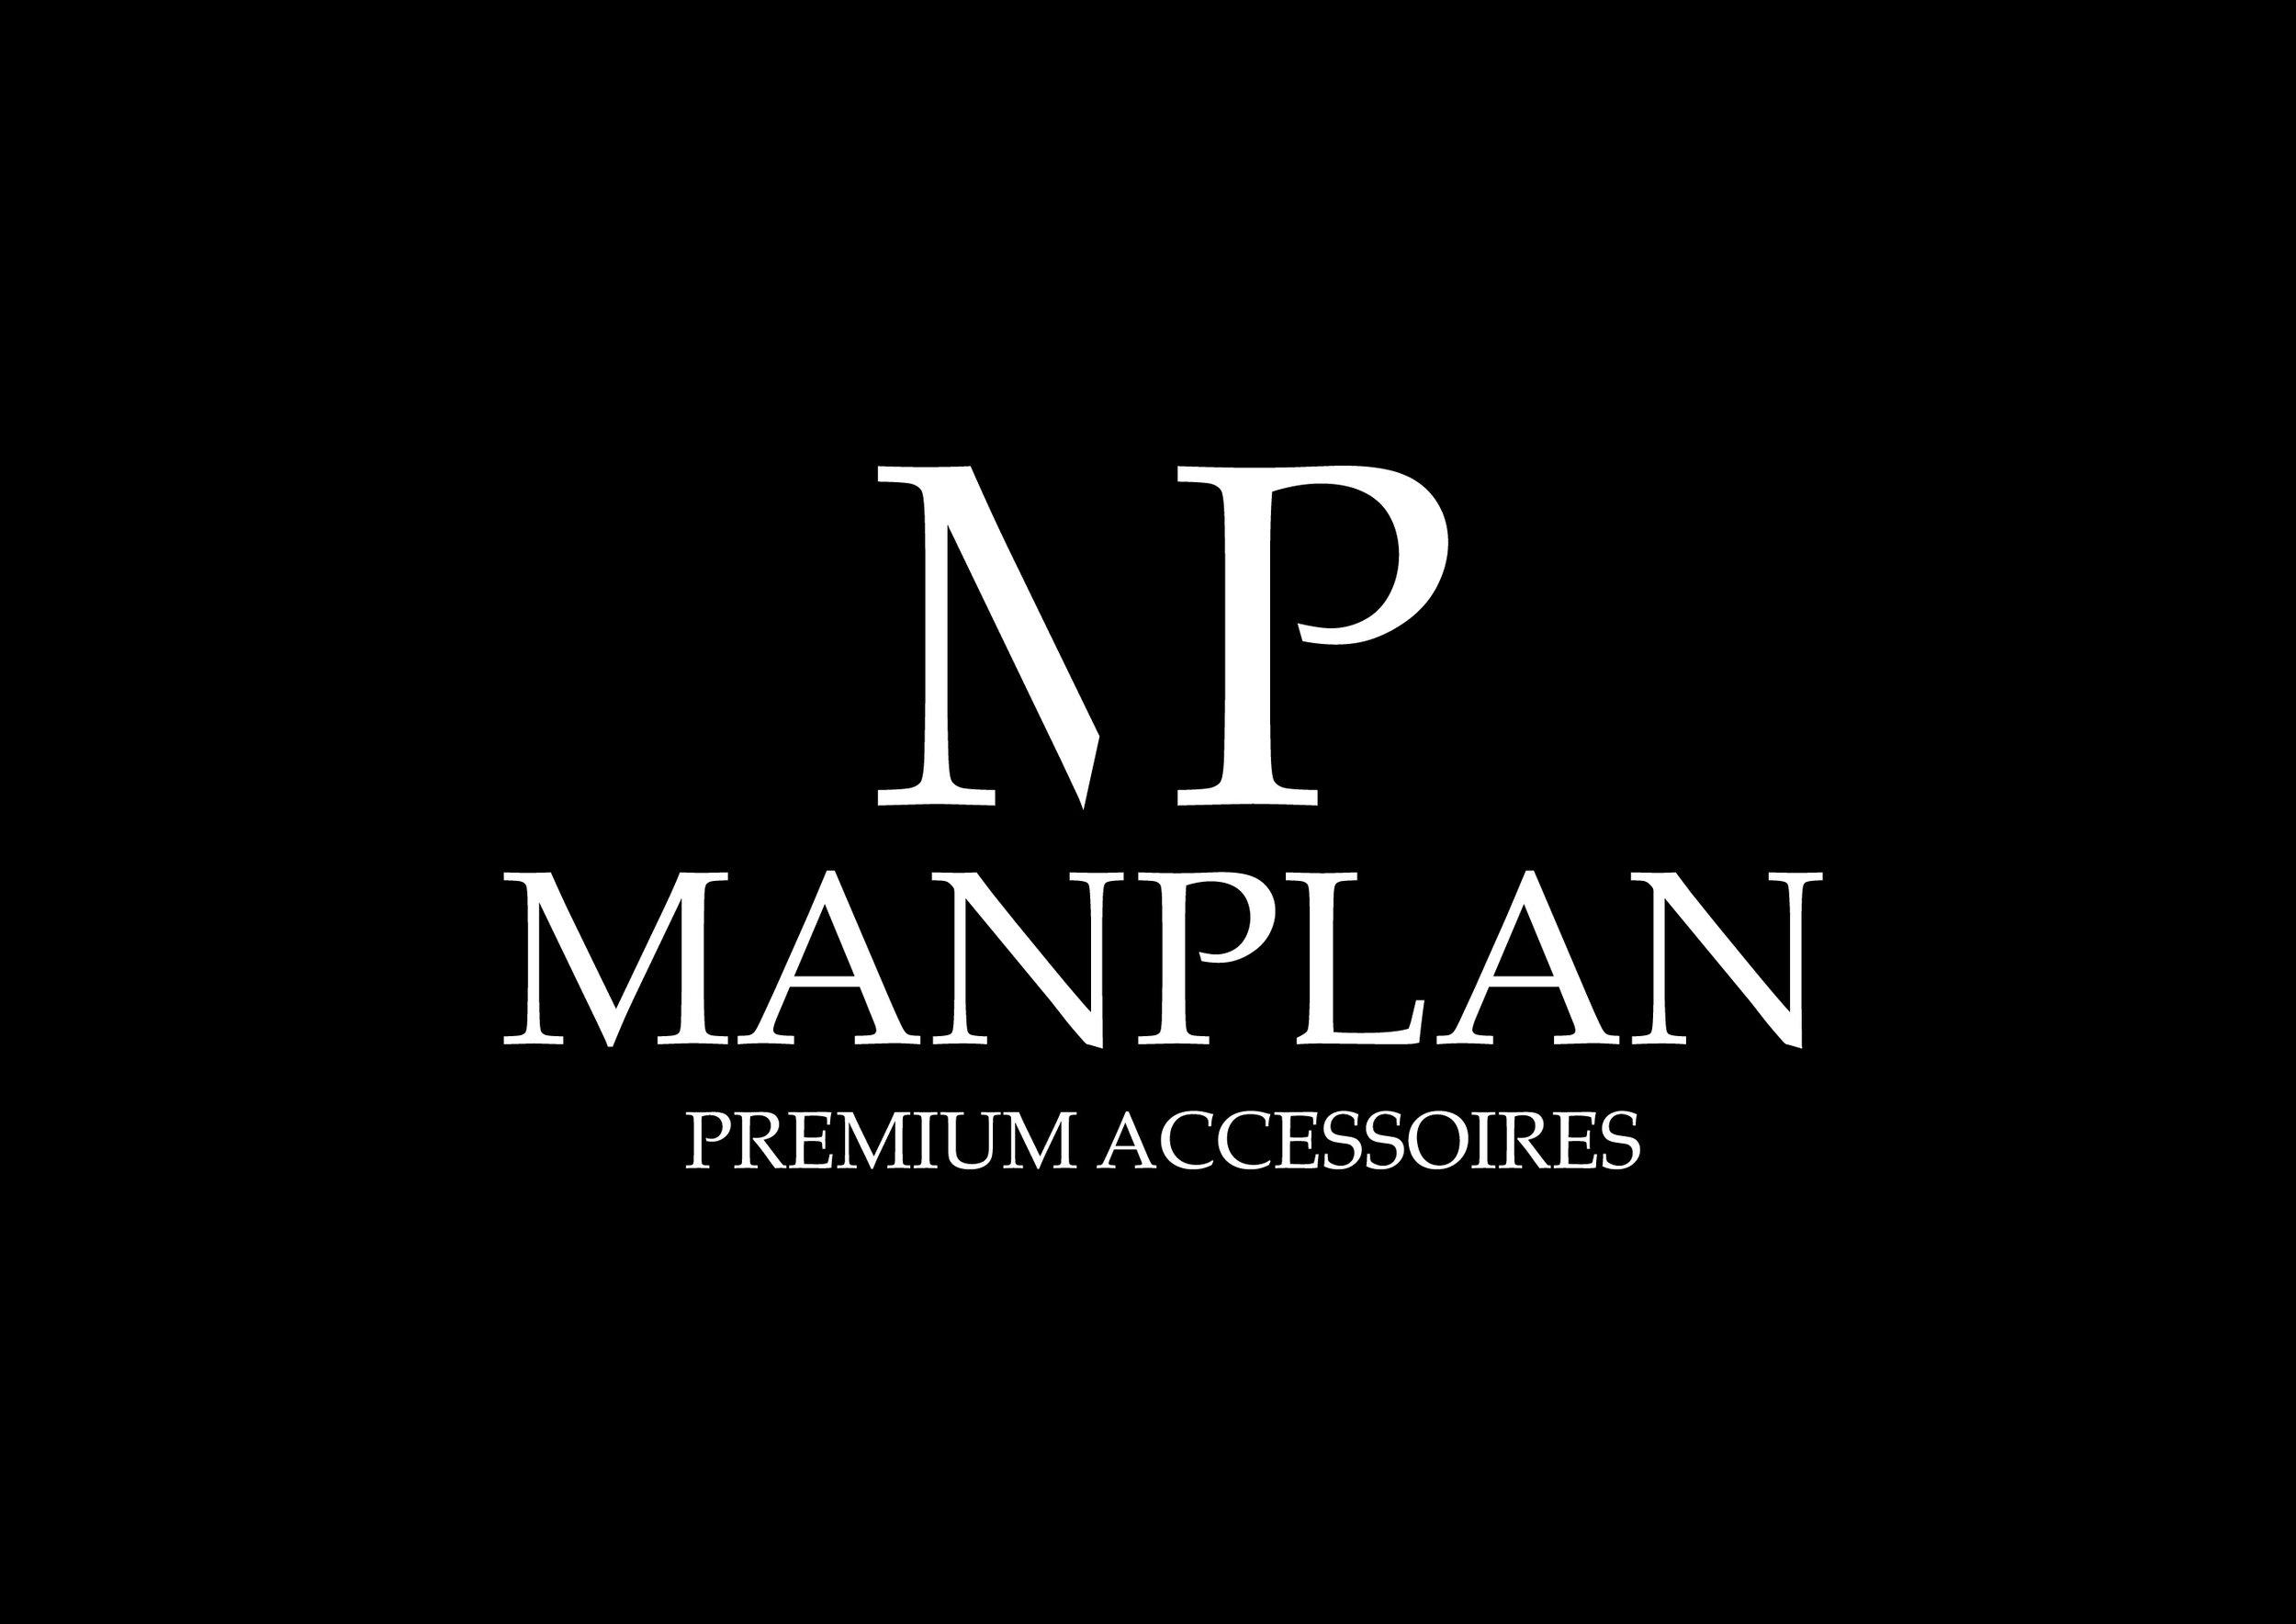 Logo(schwarz)_Manplan.jpg